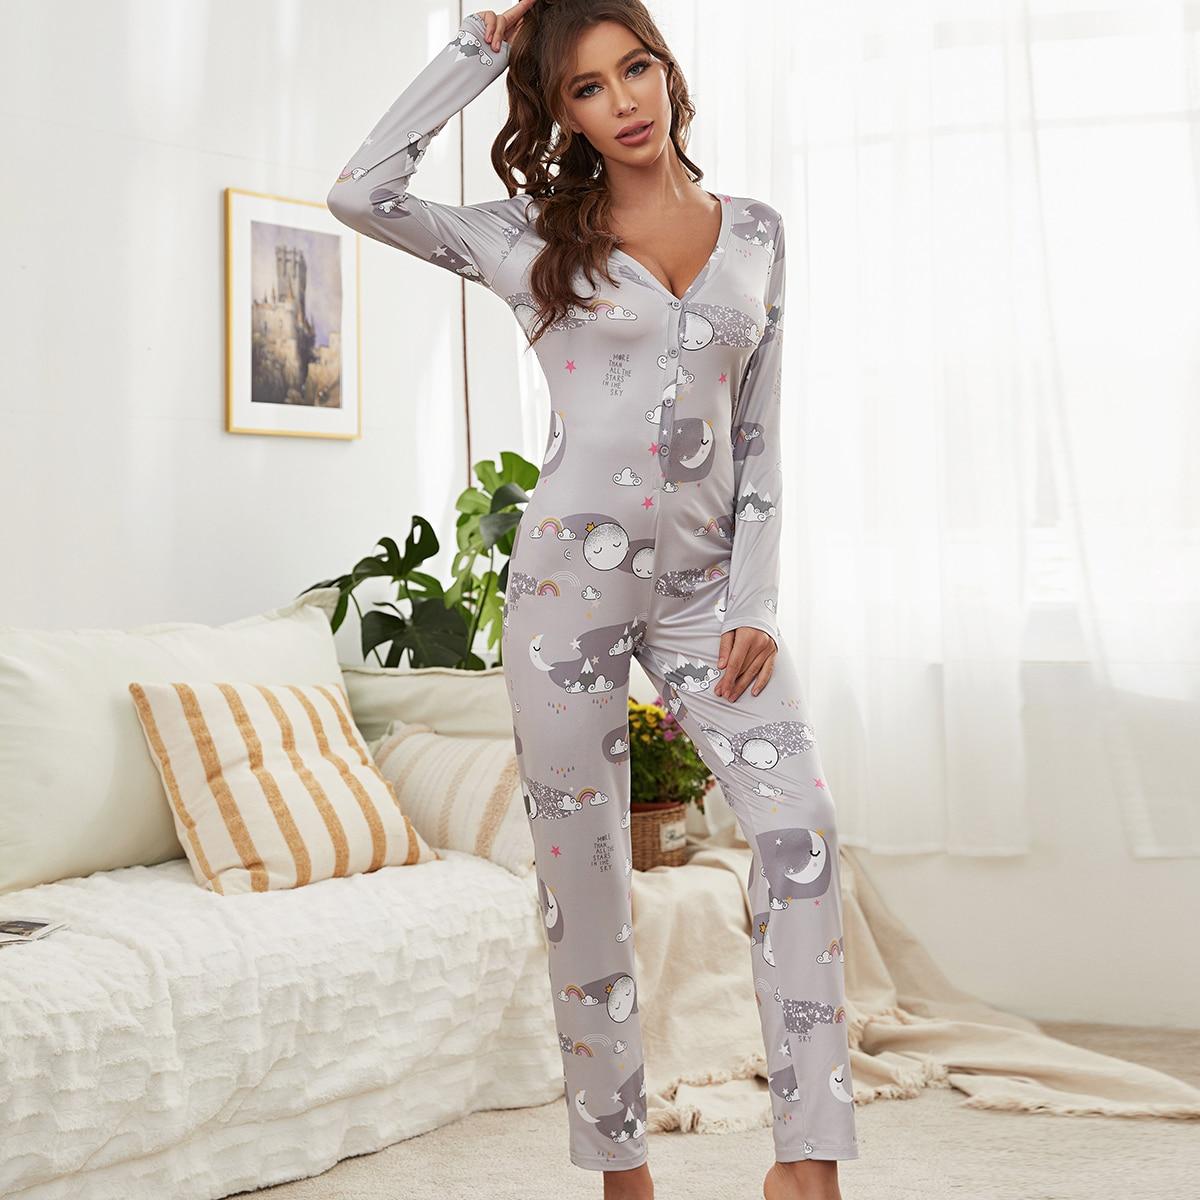 Комбинезон-пижама с принтом и глубоким воротником